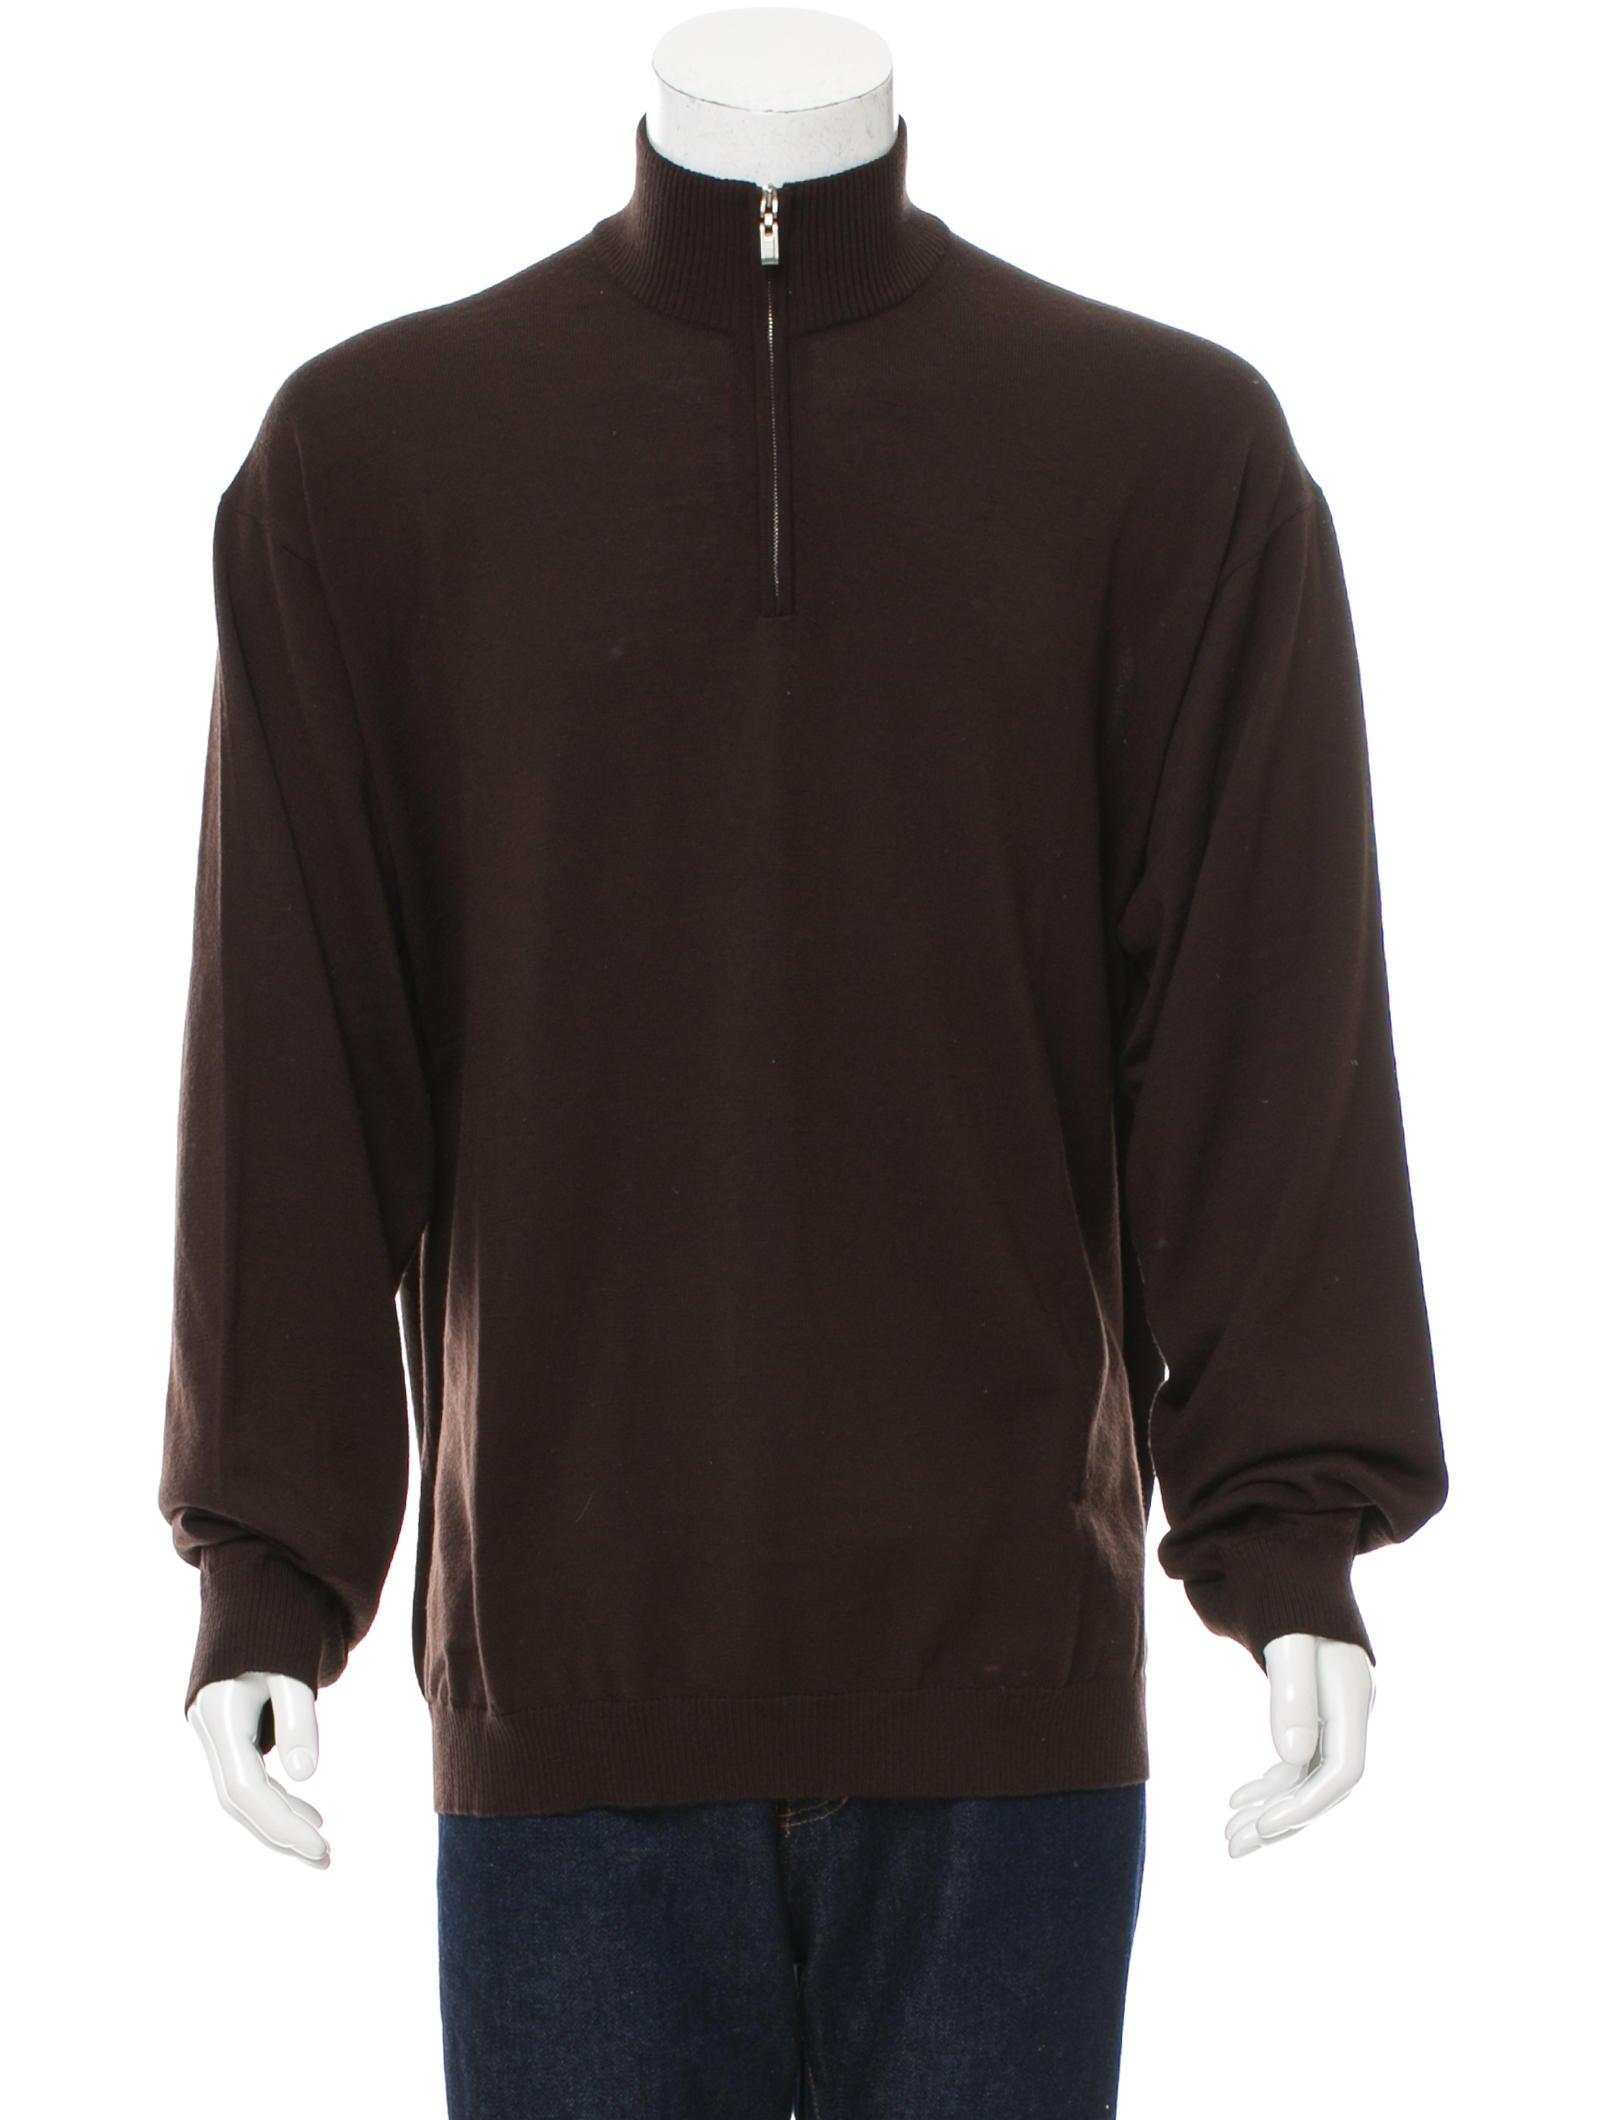 Ermenegildo Zegna Wool Half-Zip Sweater - Clothing - ZGN24290 | The RealReal